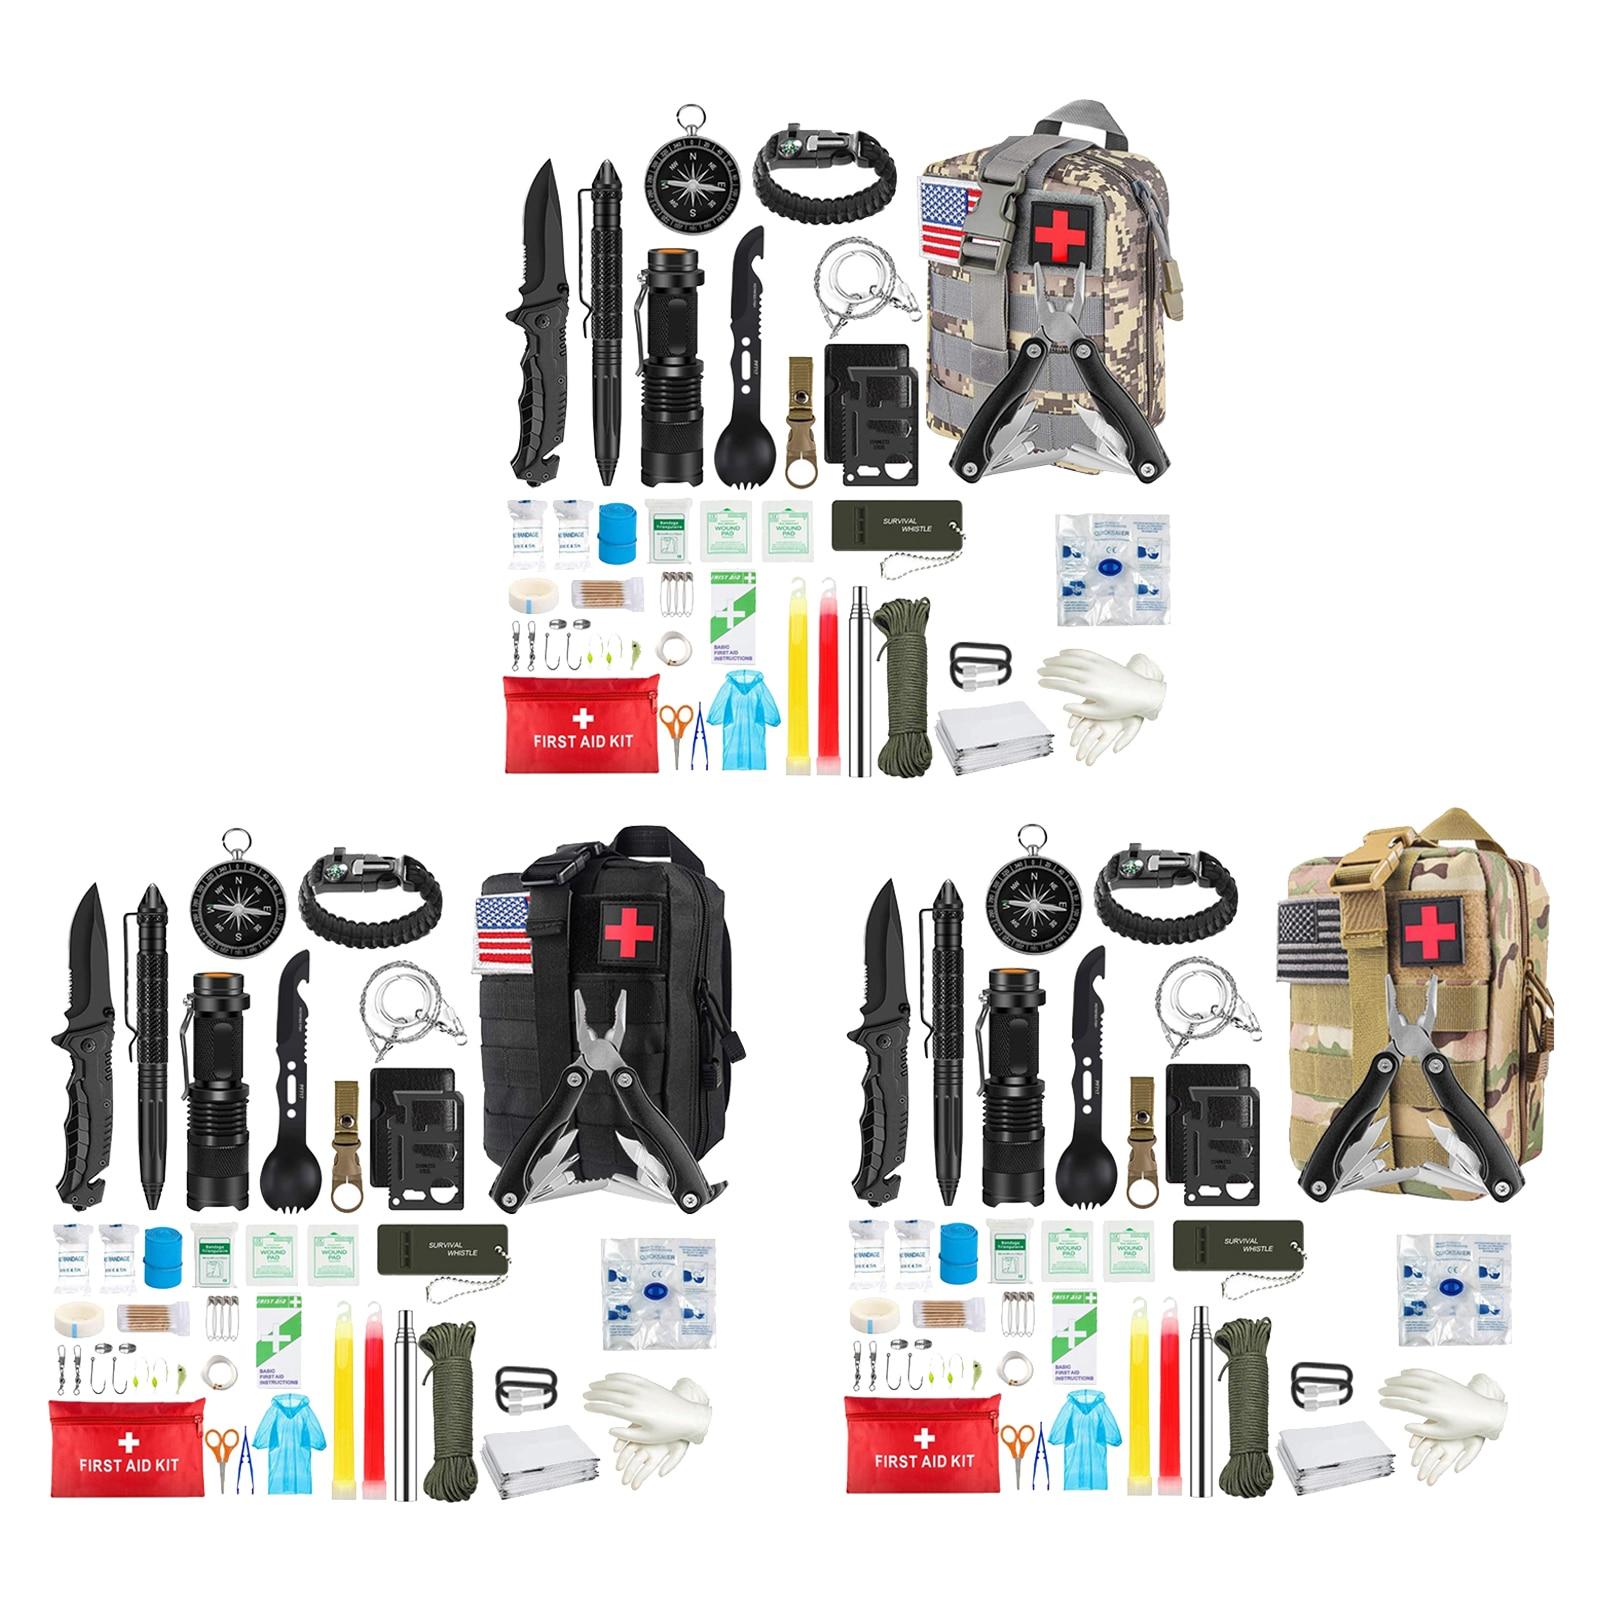 33 In 1 Emergency Survival Gear Kit Outdoor Hiking Tactical SOS Unisex Women Men Survival Gear